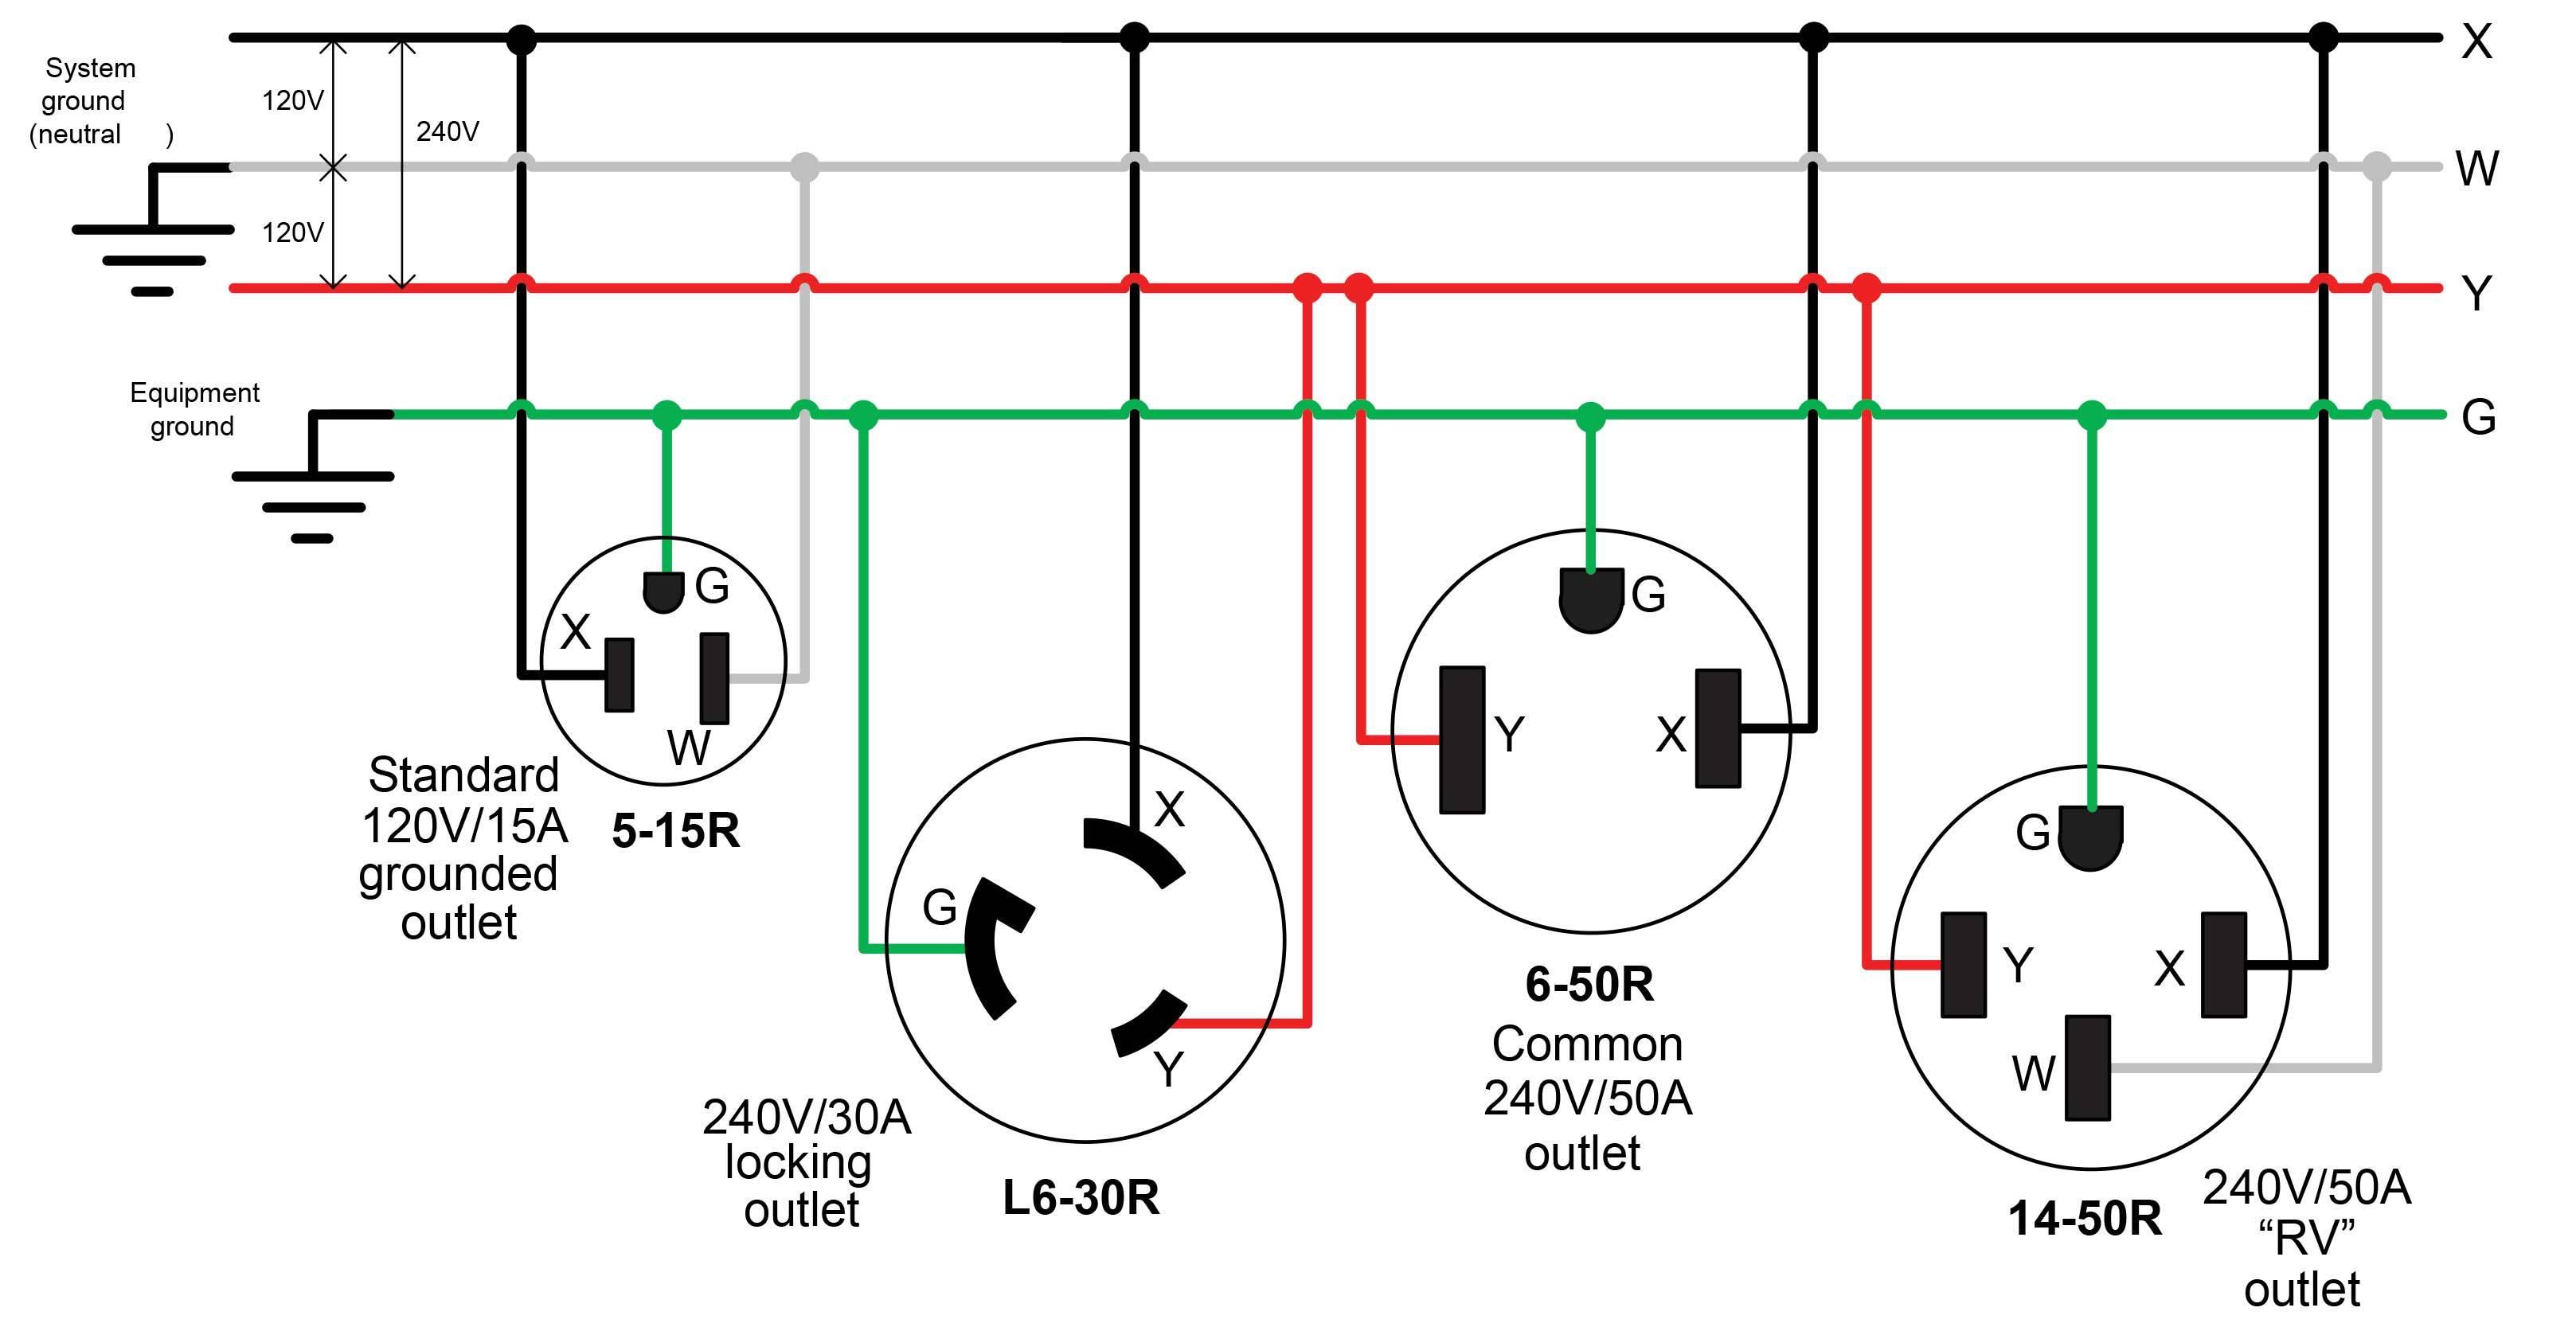 Nema 10 30R 240 Volt 30 Amp Plug Wire Diagrams | Manual E-Books - 30 Amp Plug Wiring Diagram